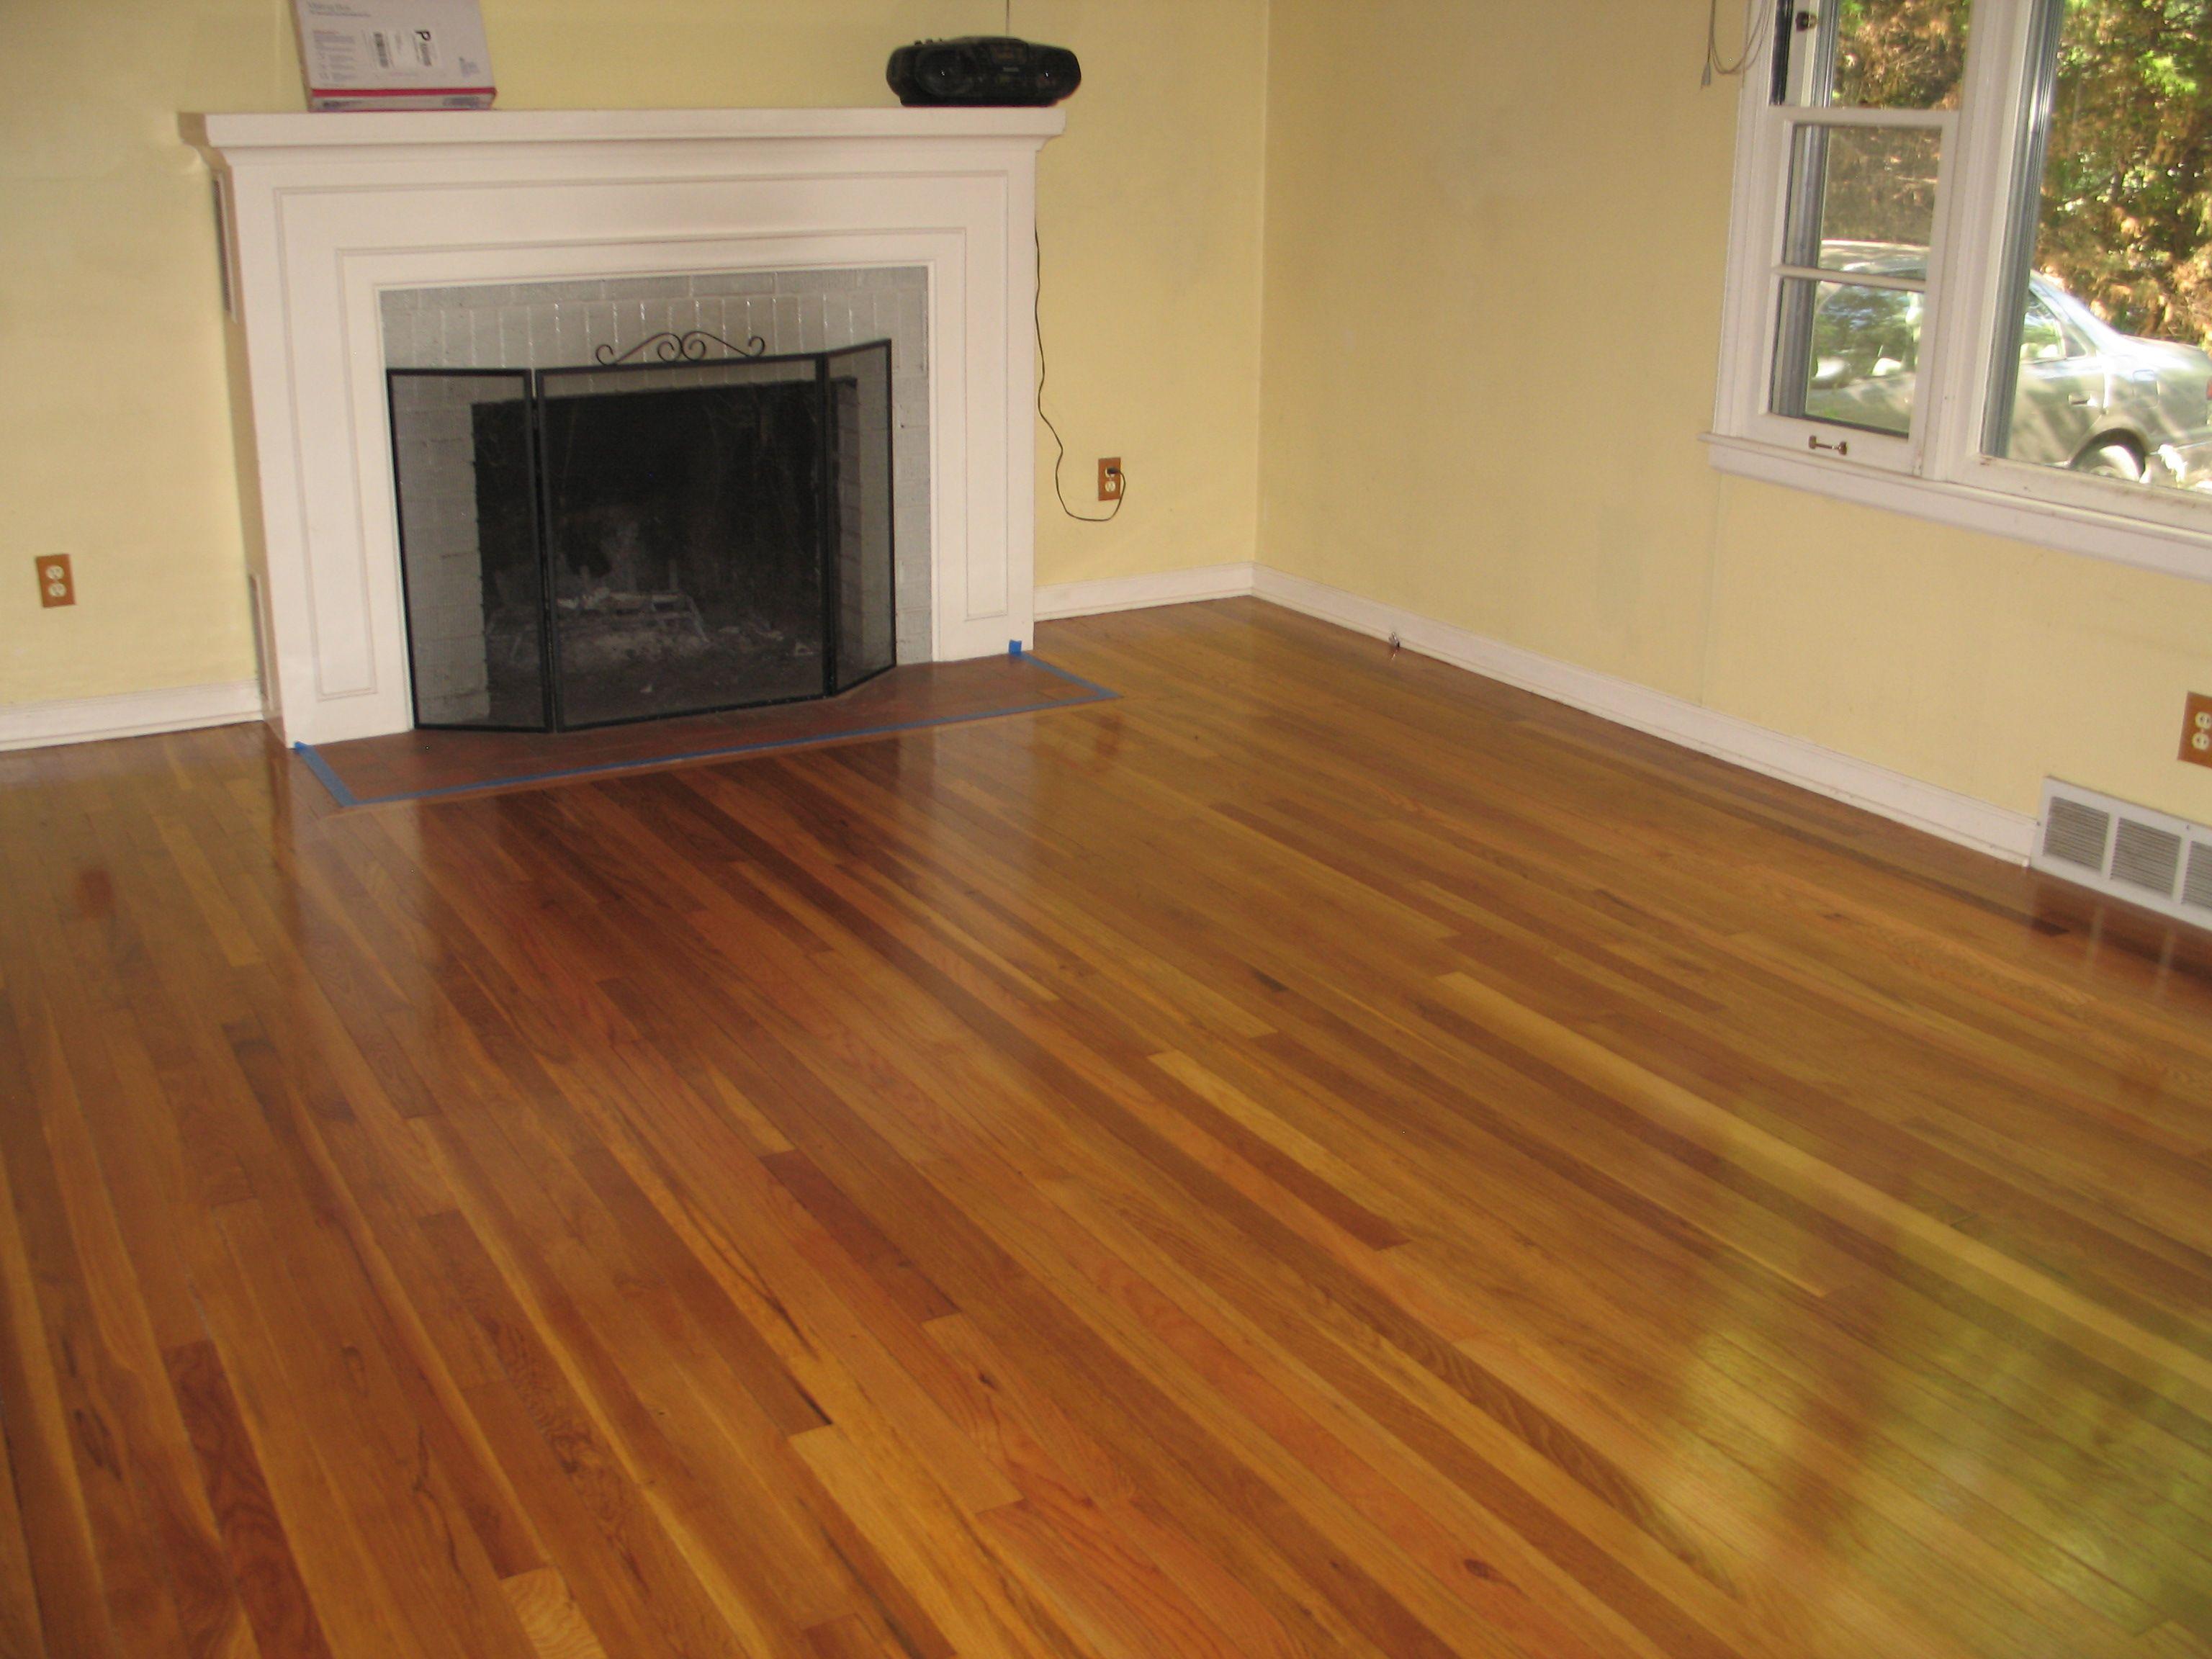 Great Methods To Use For Refinishing Hardwood Floors - Hardwood floor refinishing pittsburgh